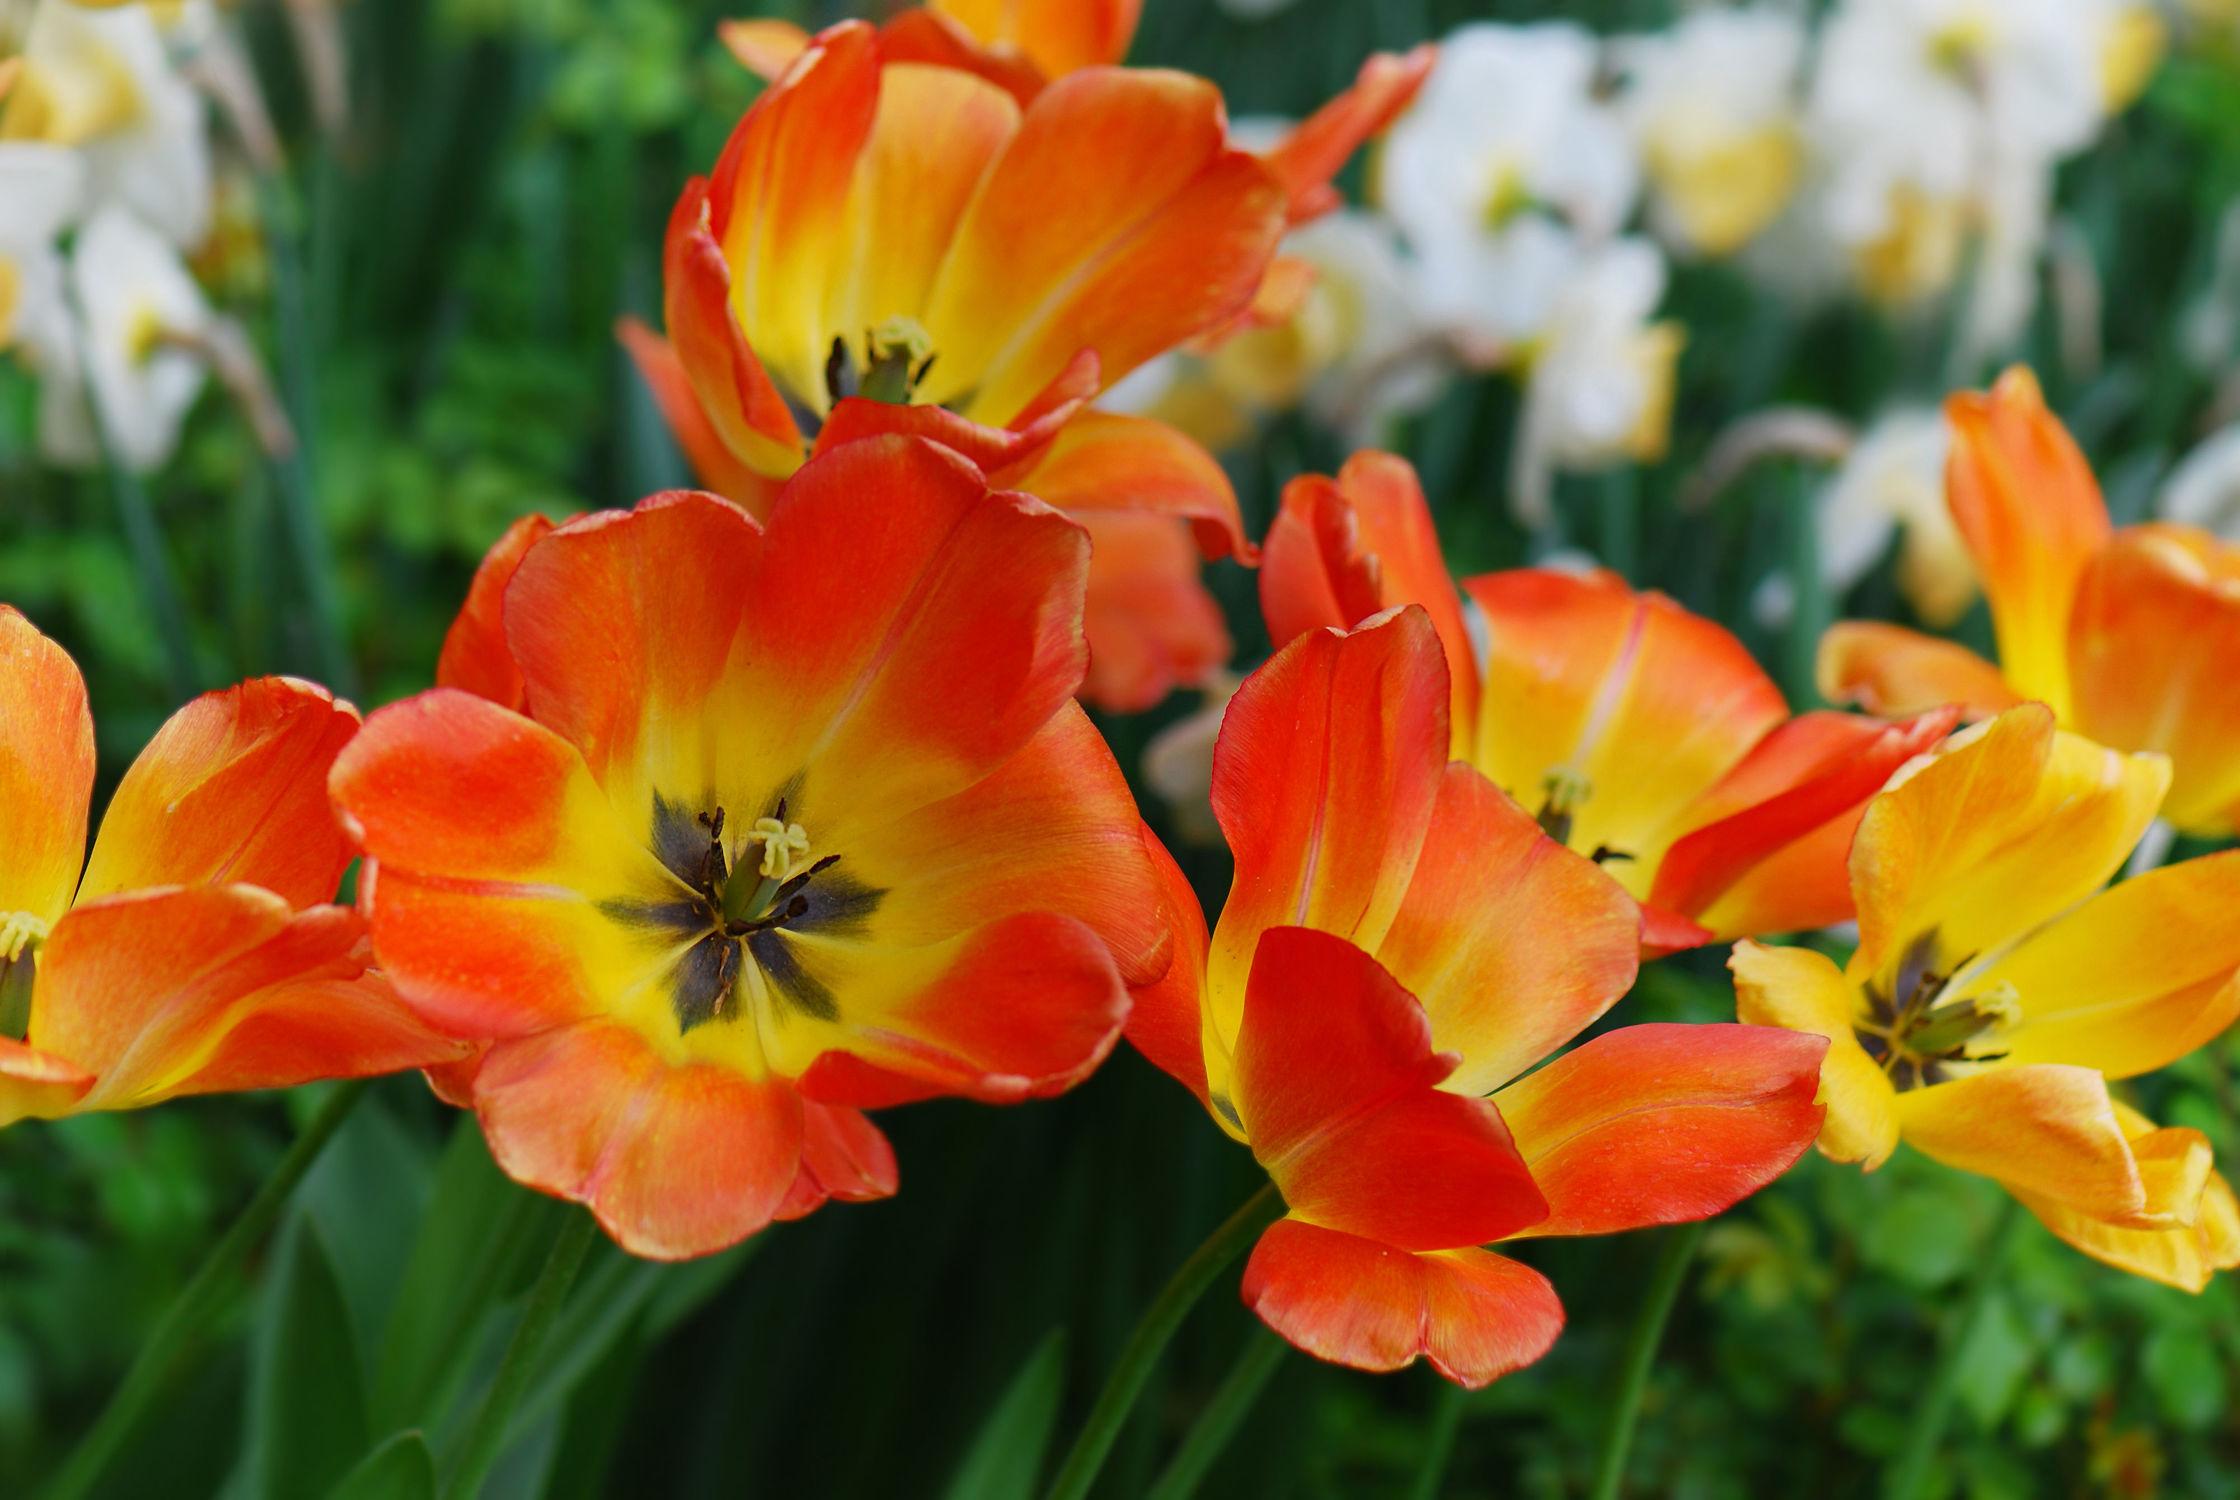 Bild mit Gelb, Pflanzen, Blumen, Frühling, Rot, Makroaufnahme, Blume, Makro, Tulpe, Tulpen, frühlingsblumen, dekorativ, tulpenwiese